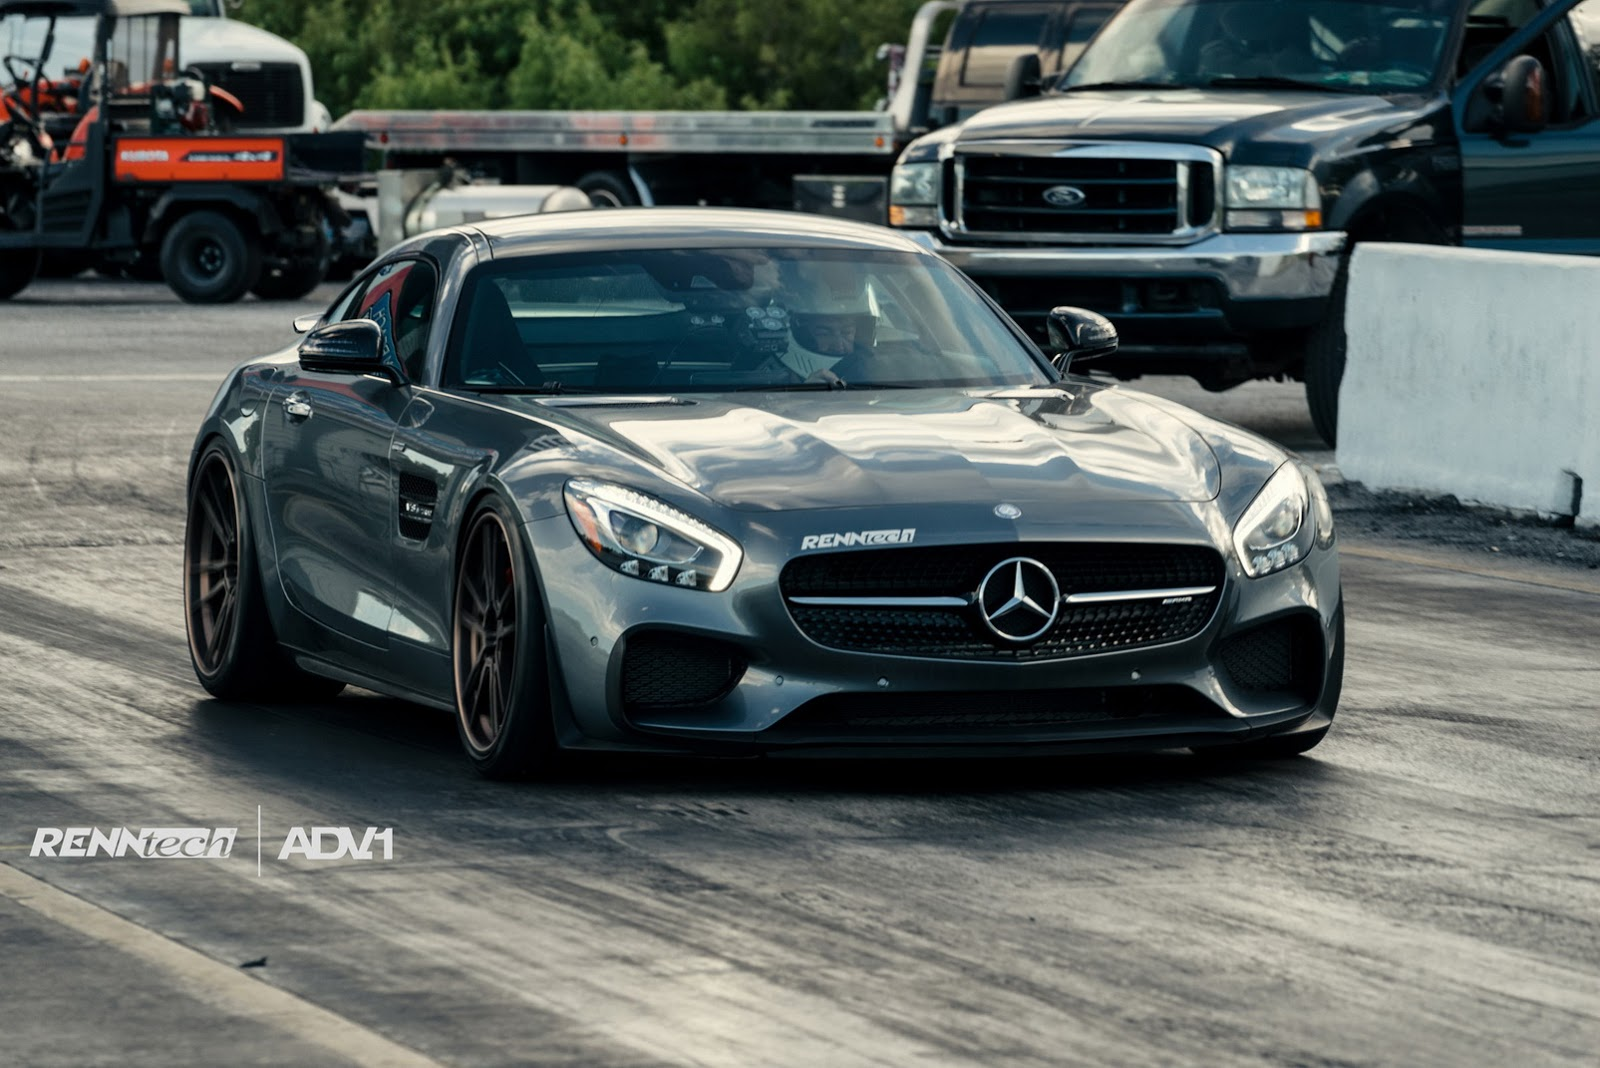 Renntech Mercedes-AMG GT S Poses at the Drag Strip - GTspirit